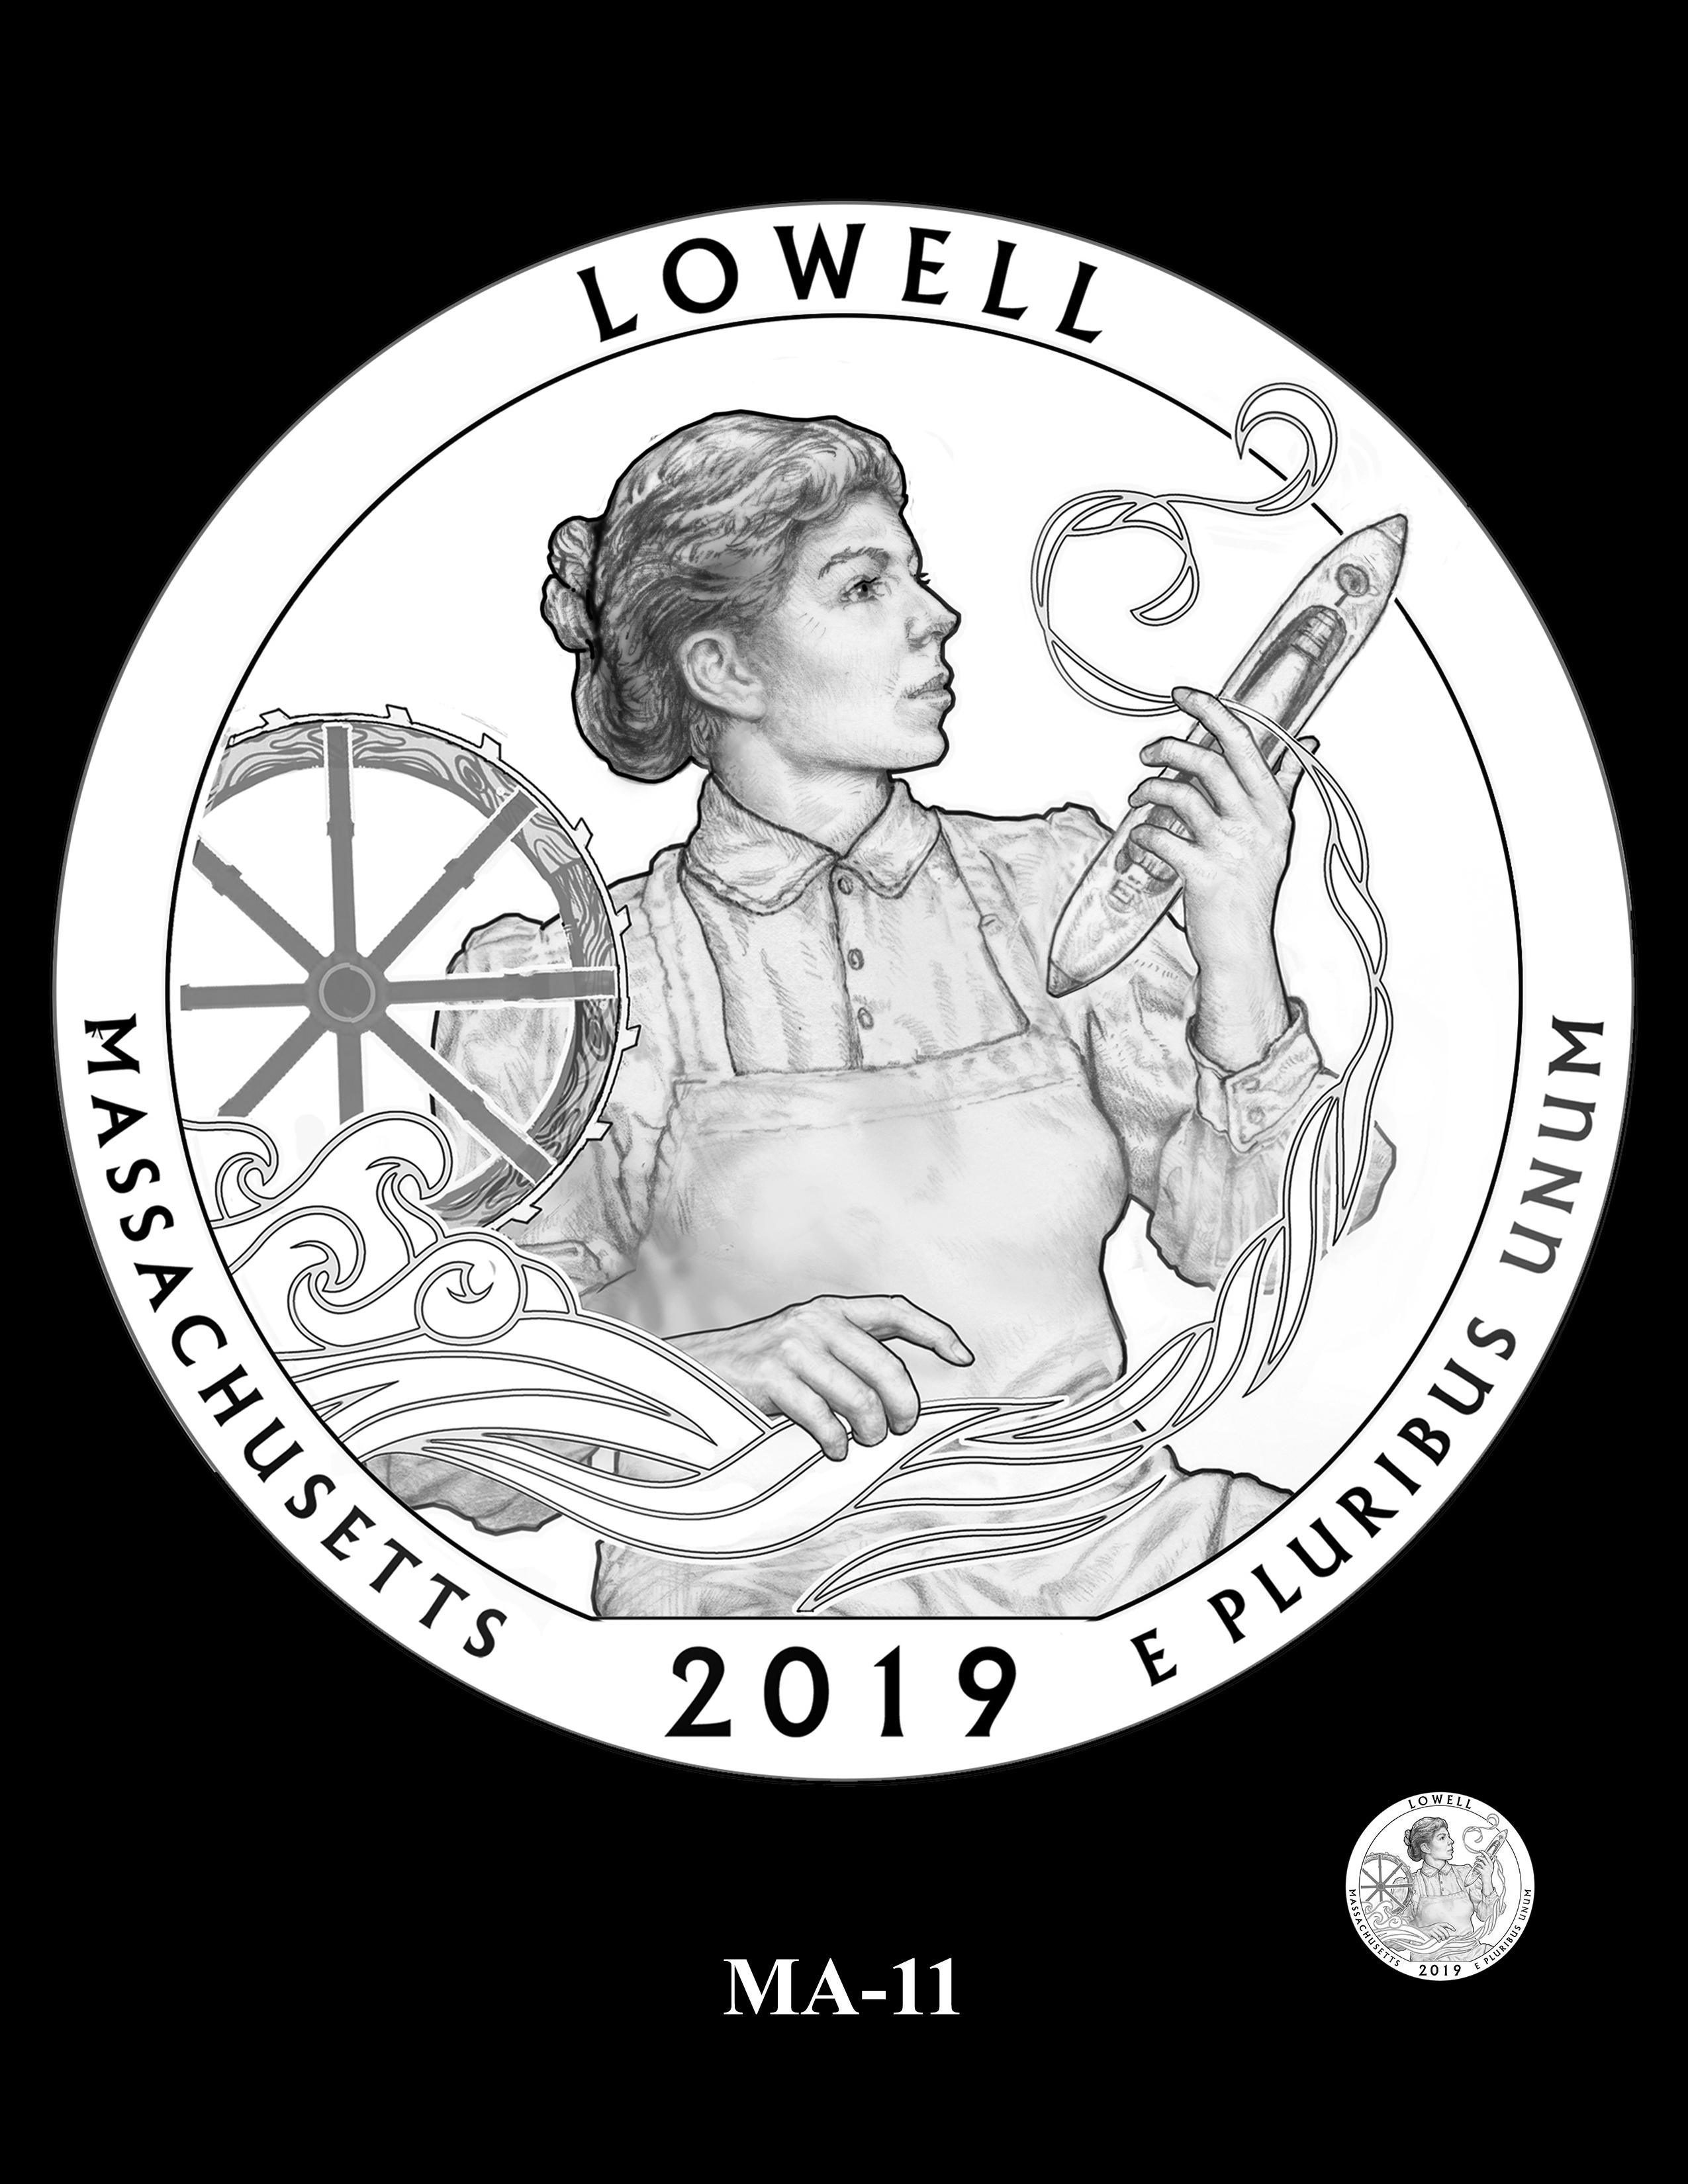 MA-11 -- 2019 America the Beautiful Quarters® Program